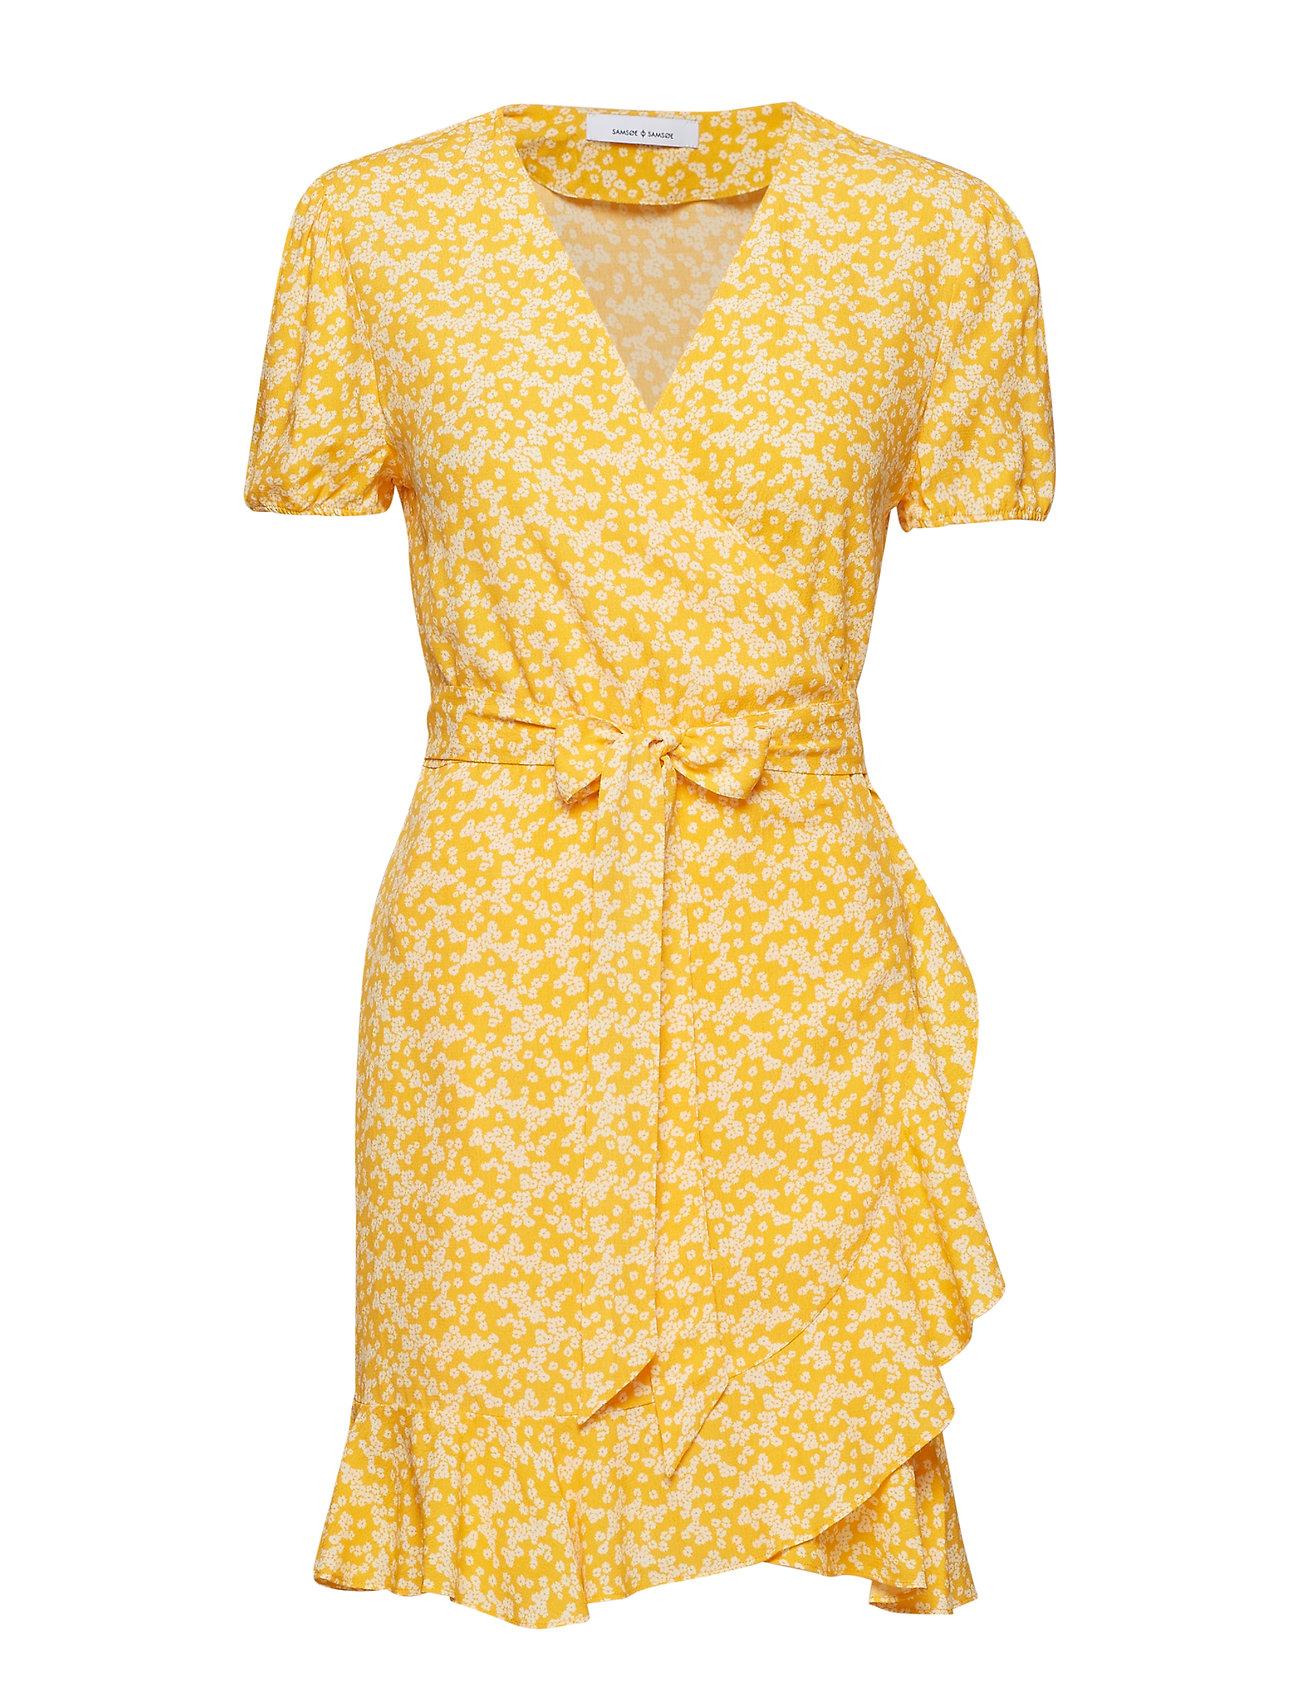 c1bcbac1b Linetta dress aop 6515